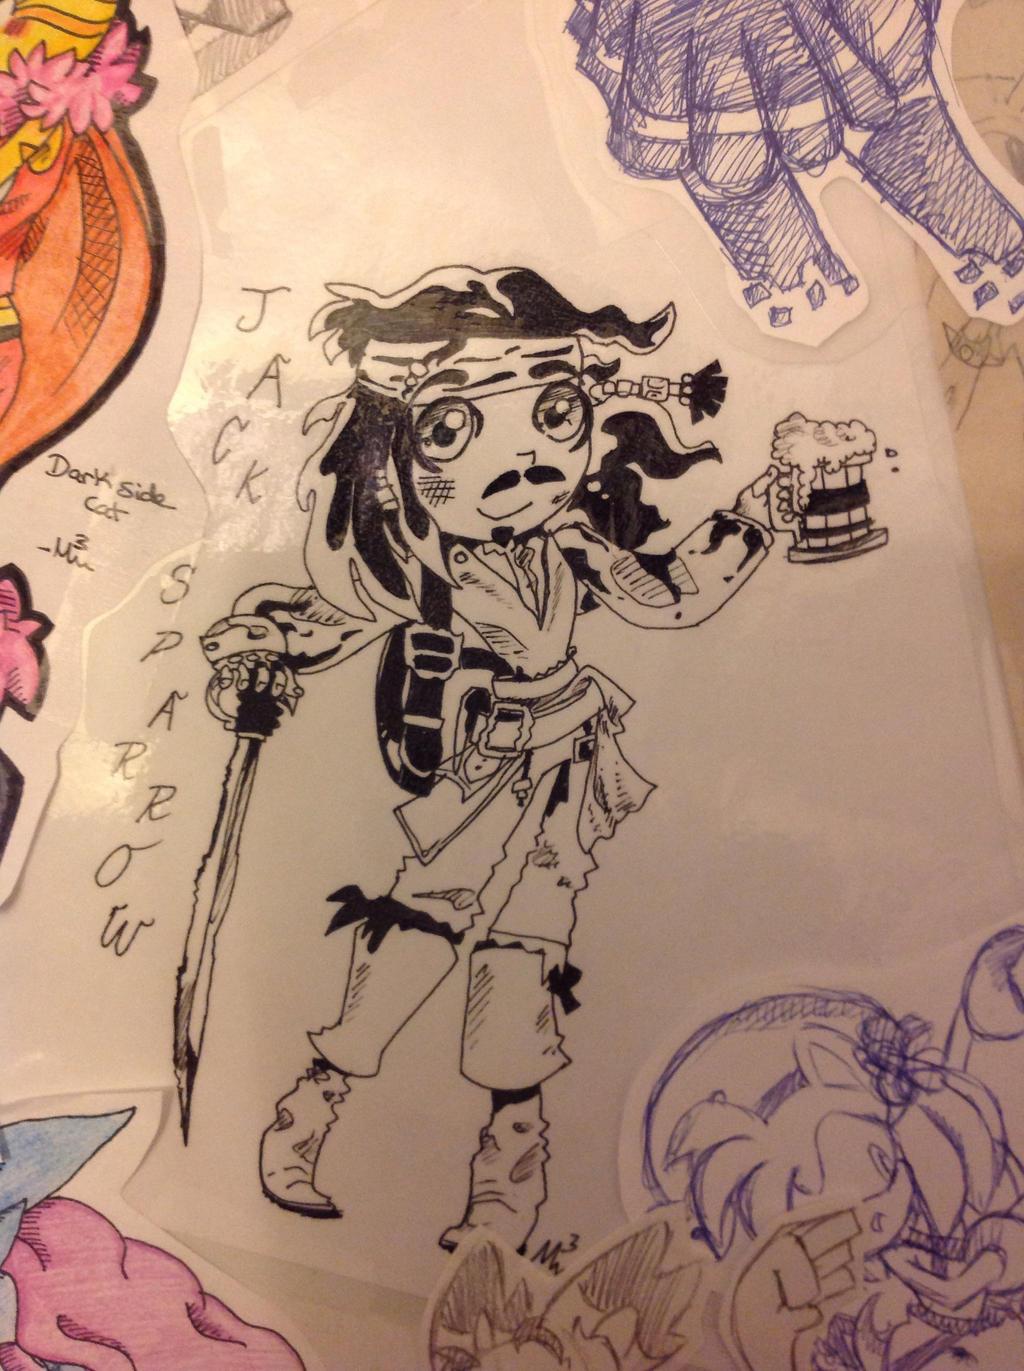 Jack Sparrow by RichHoboM3